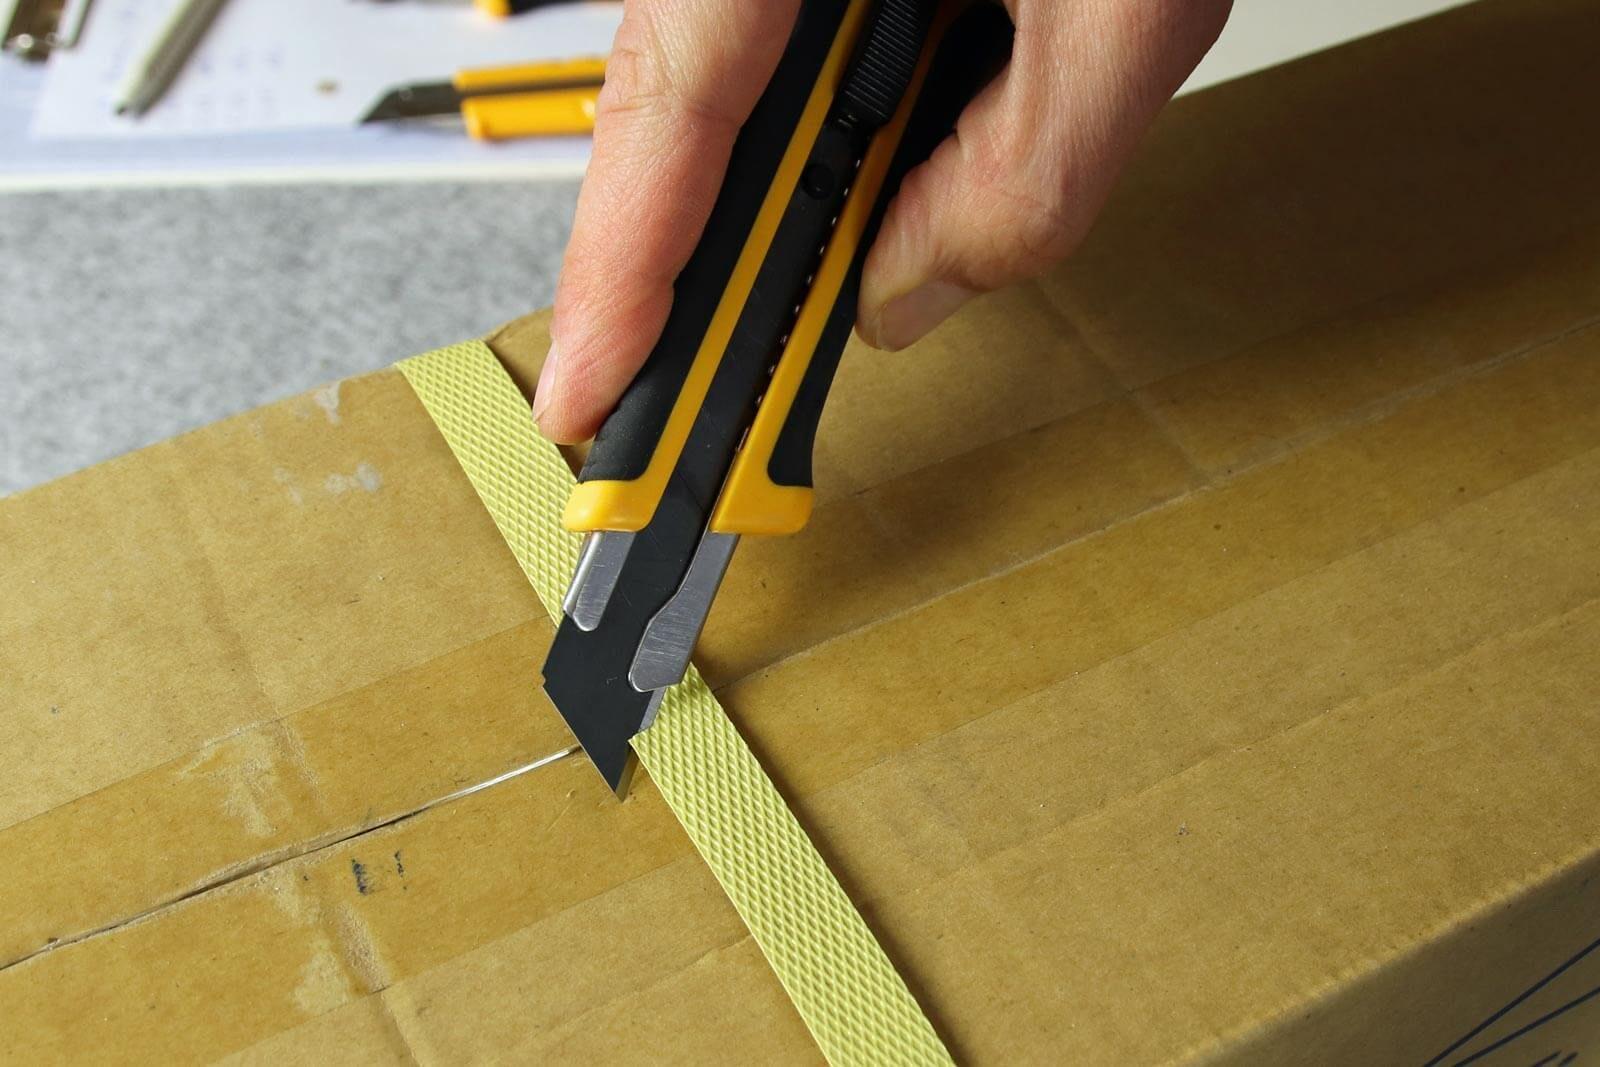 C064-Cuttermesser-18-mm-Premium-OLFA-L5-Auto-Lock-Umreifungsband-CURT-tools_1600